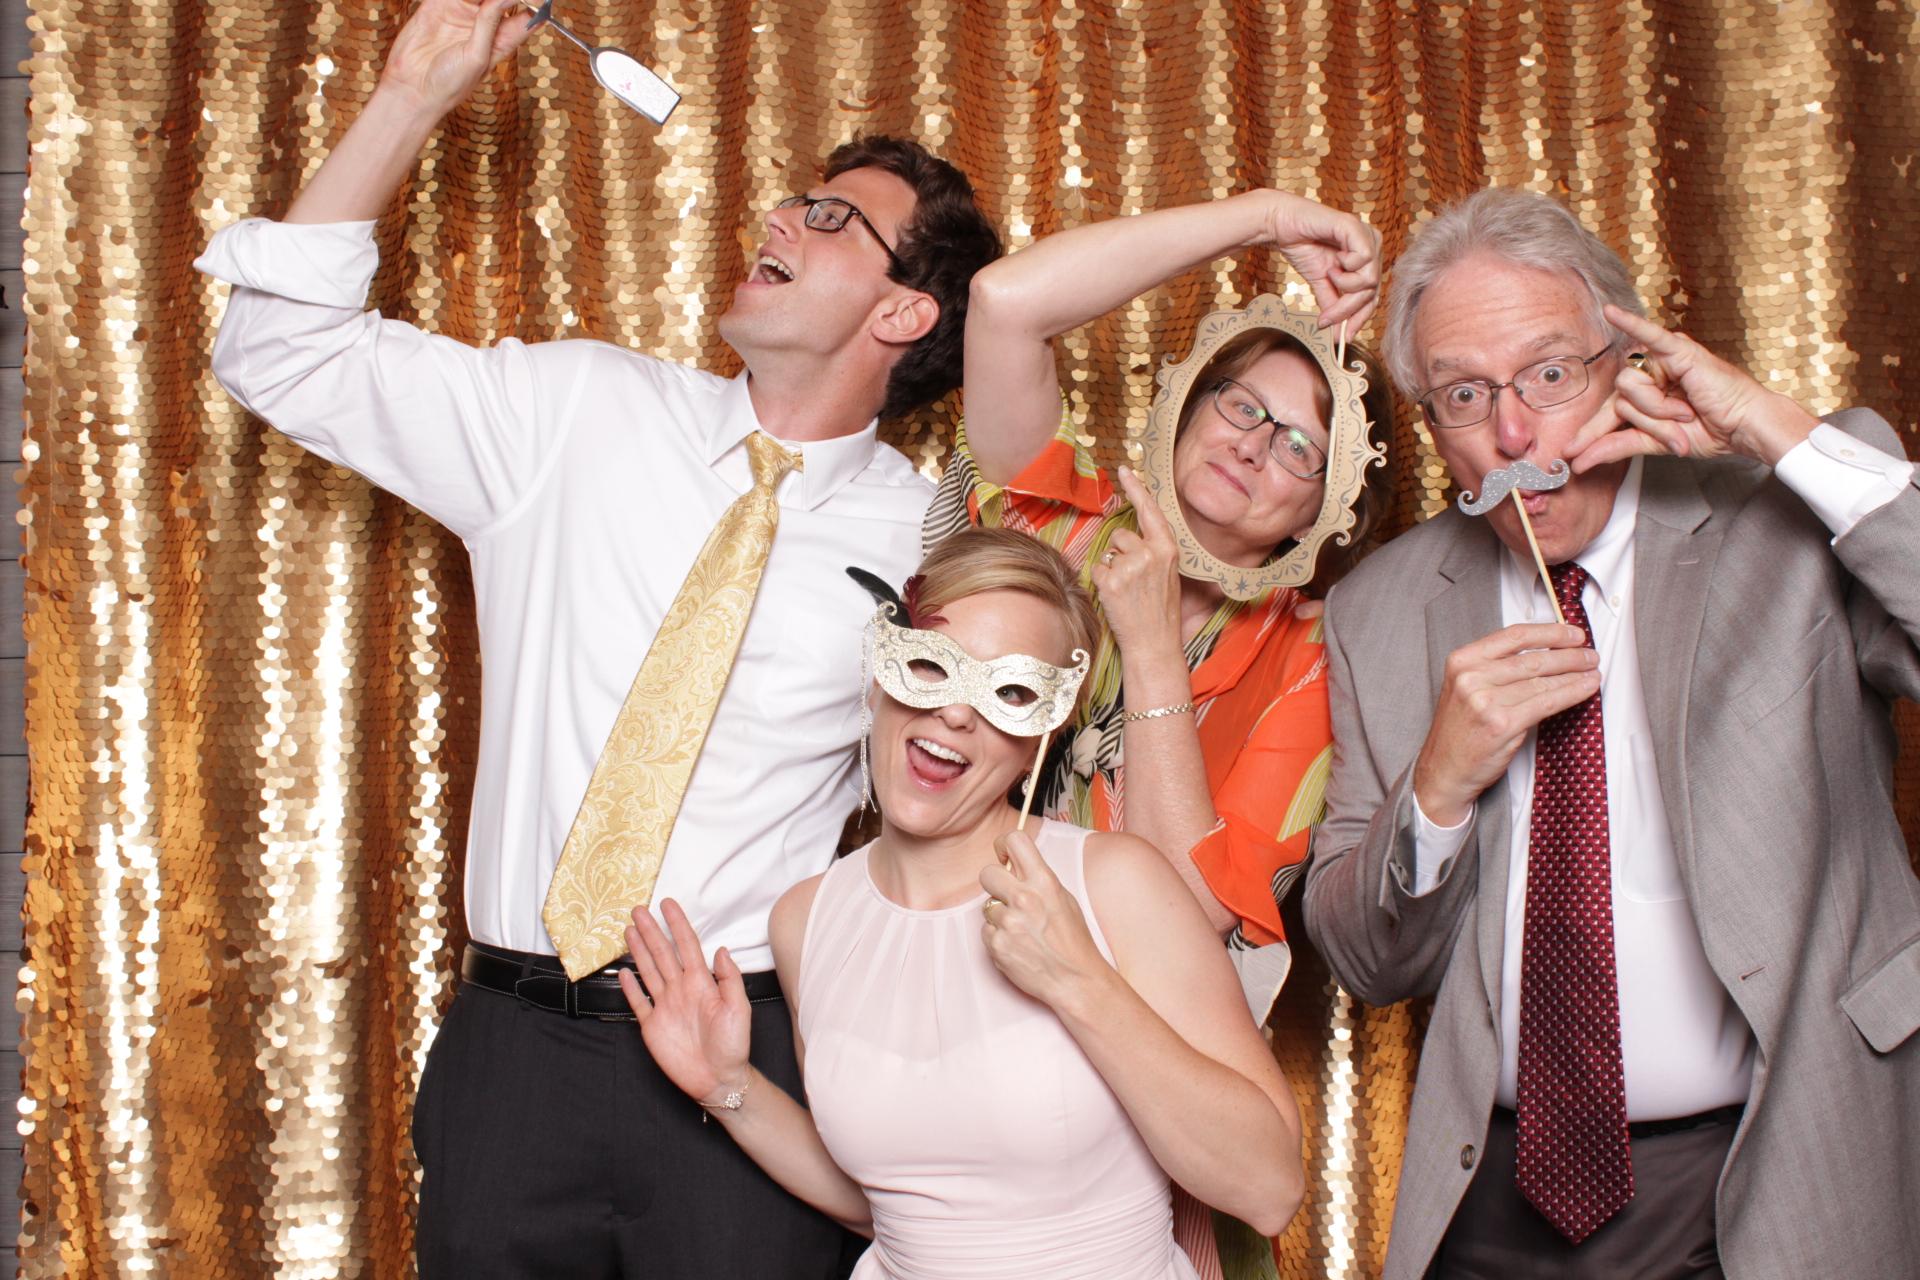 Minneapolis_wedding_photo_booth_Machine_Shop (7).jpg